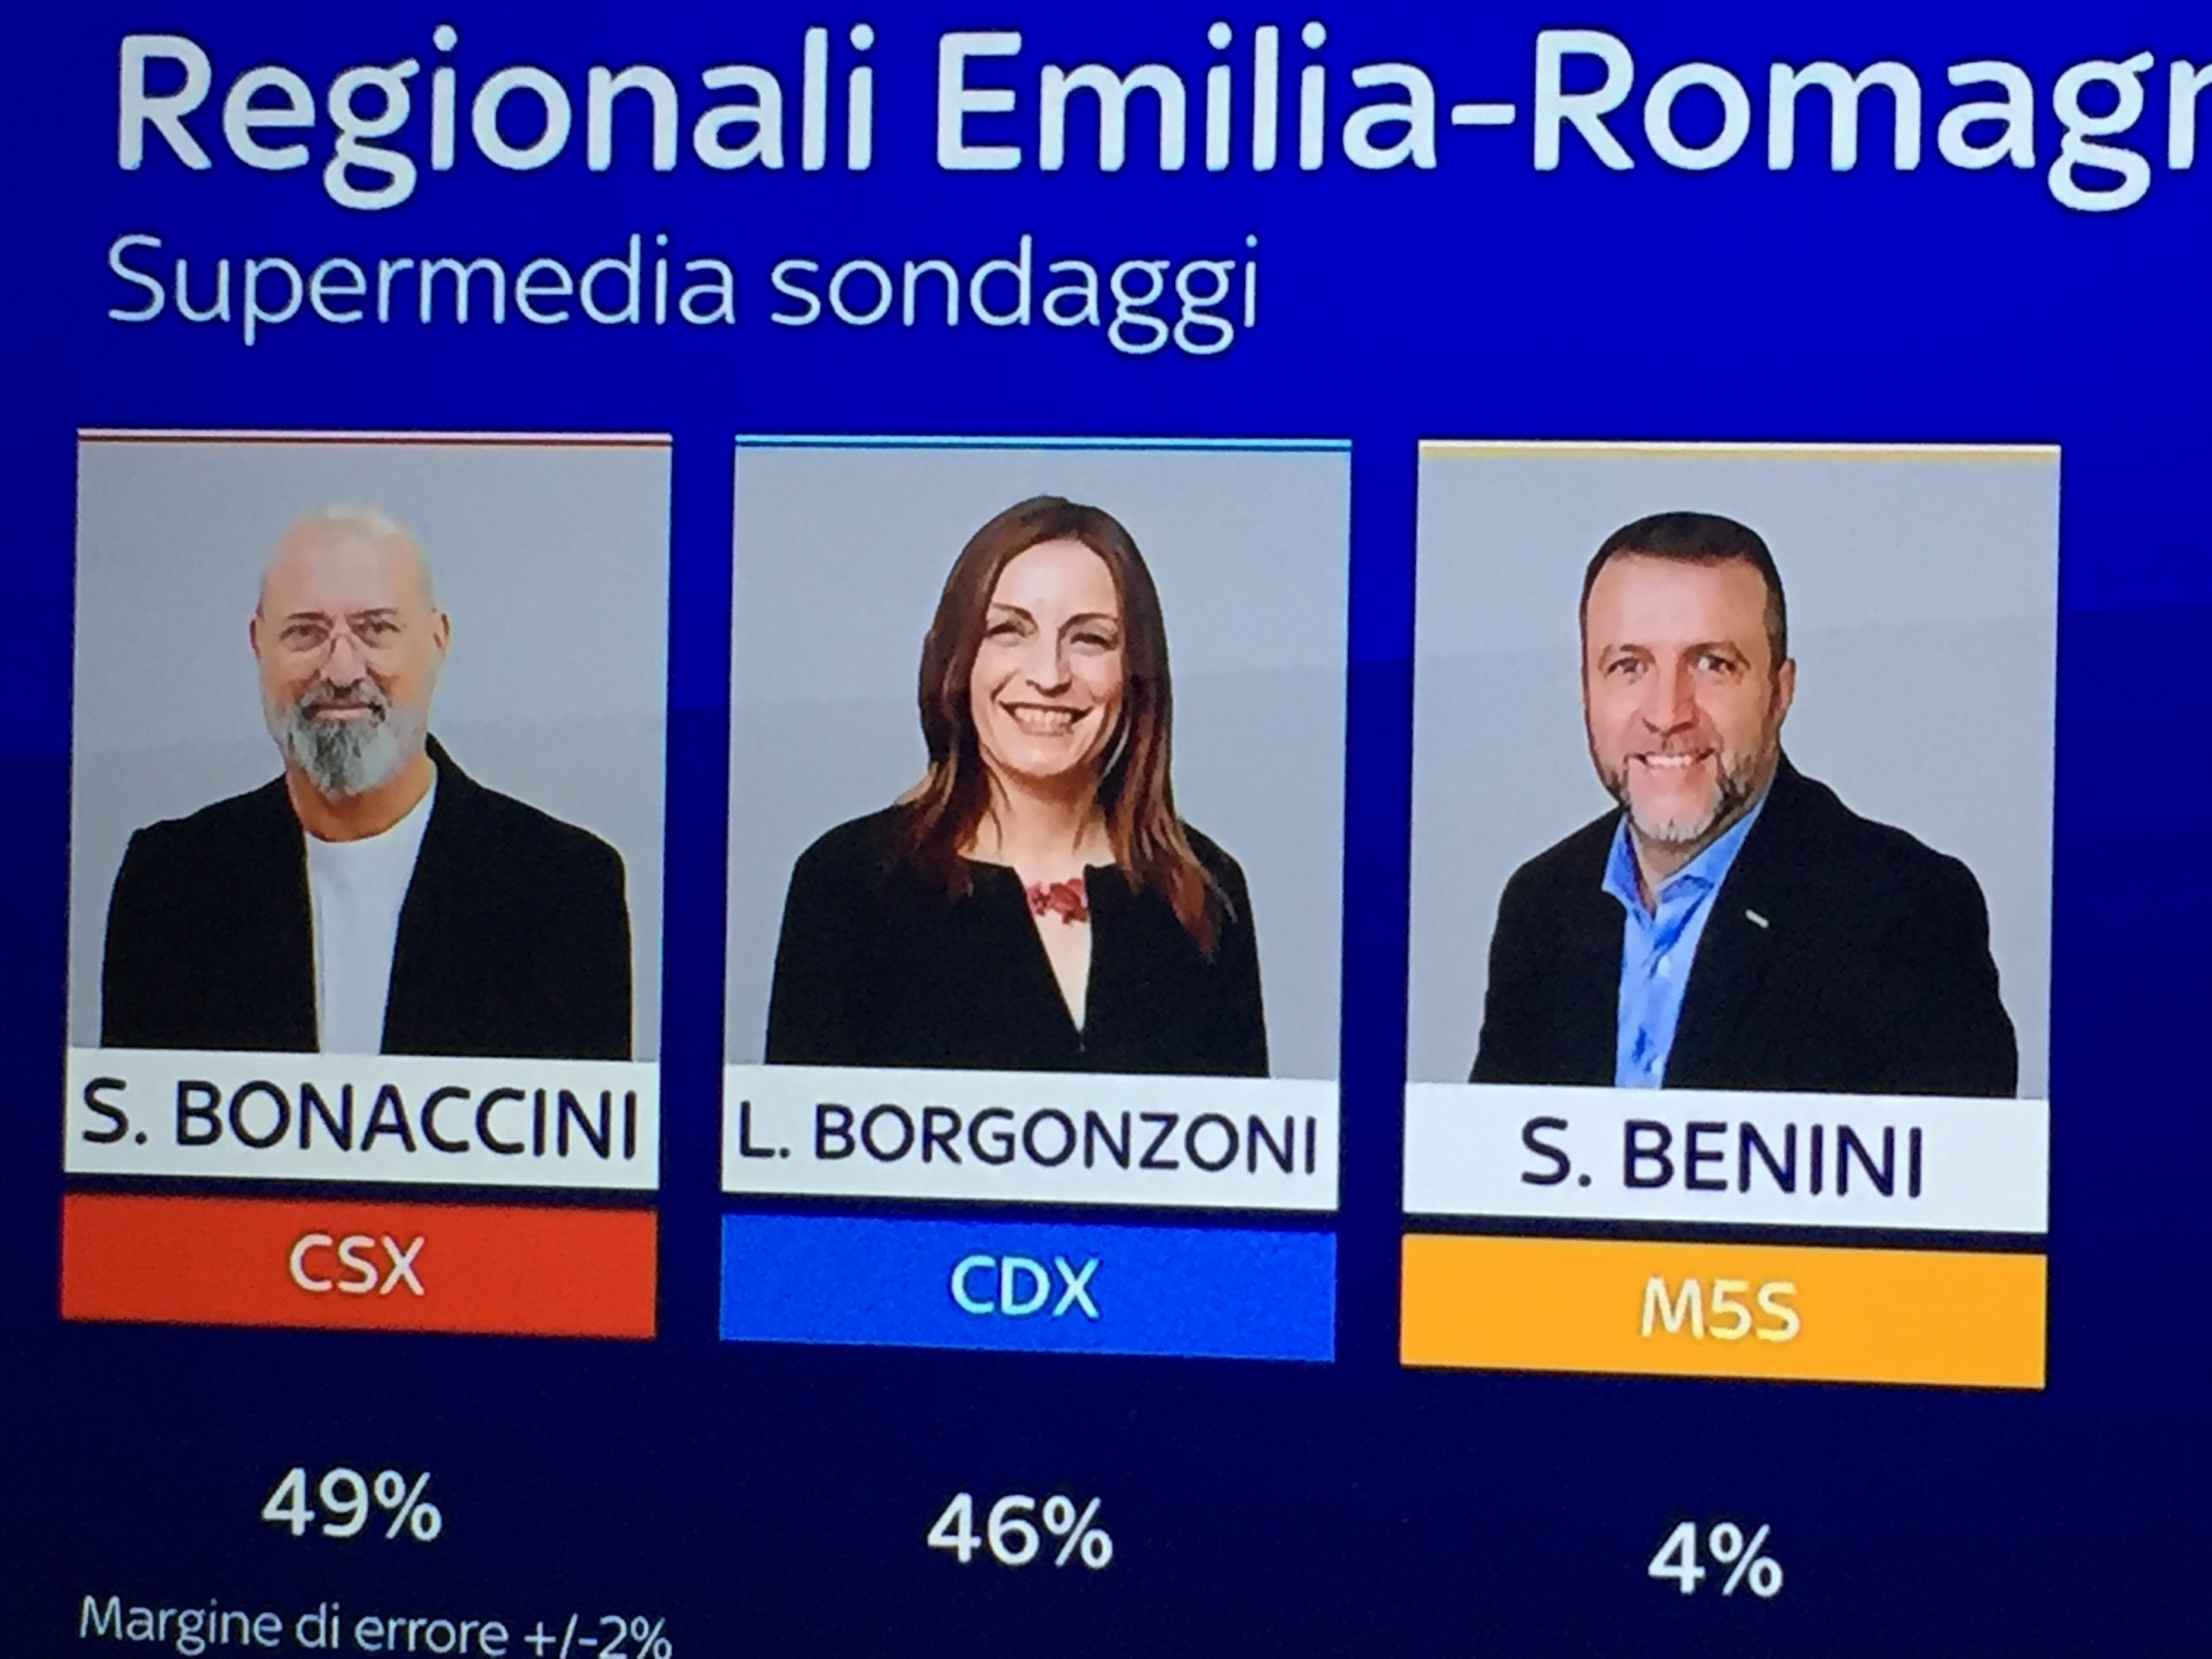 Elezioni regionali Emilia-Romagna 2020 risultati